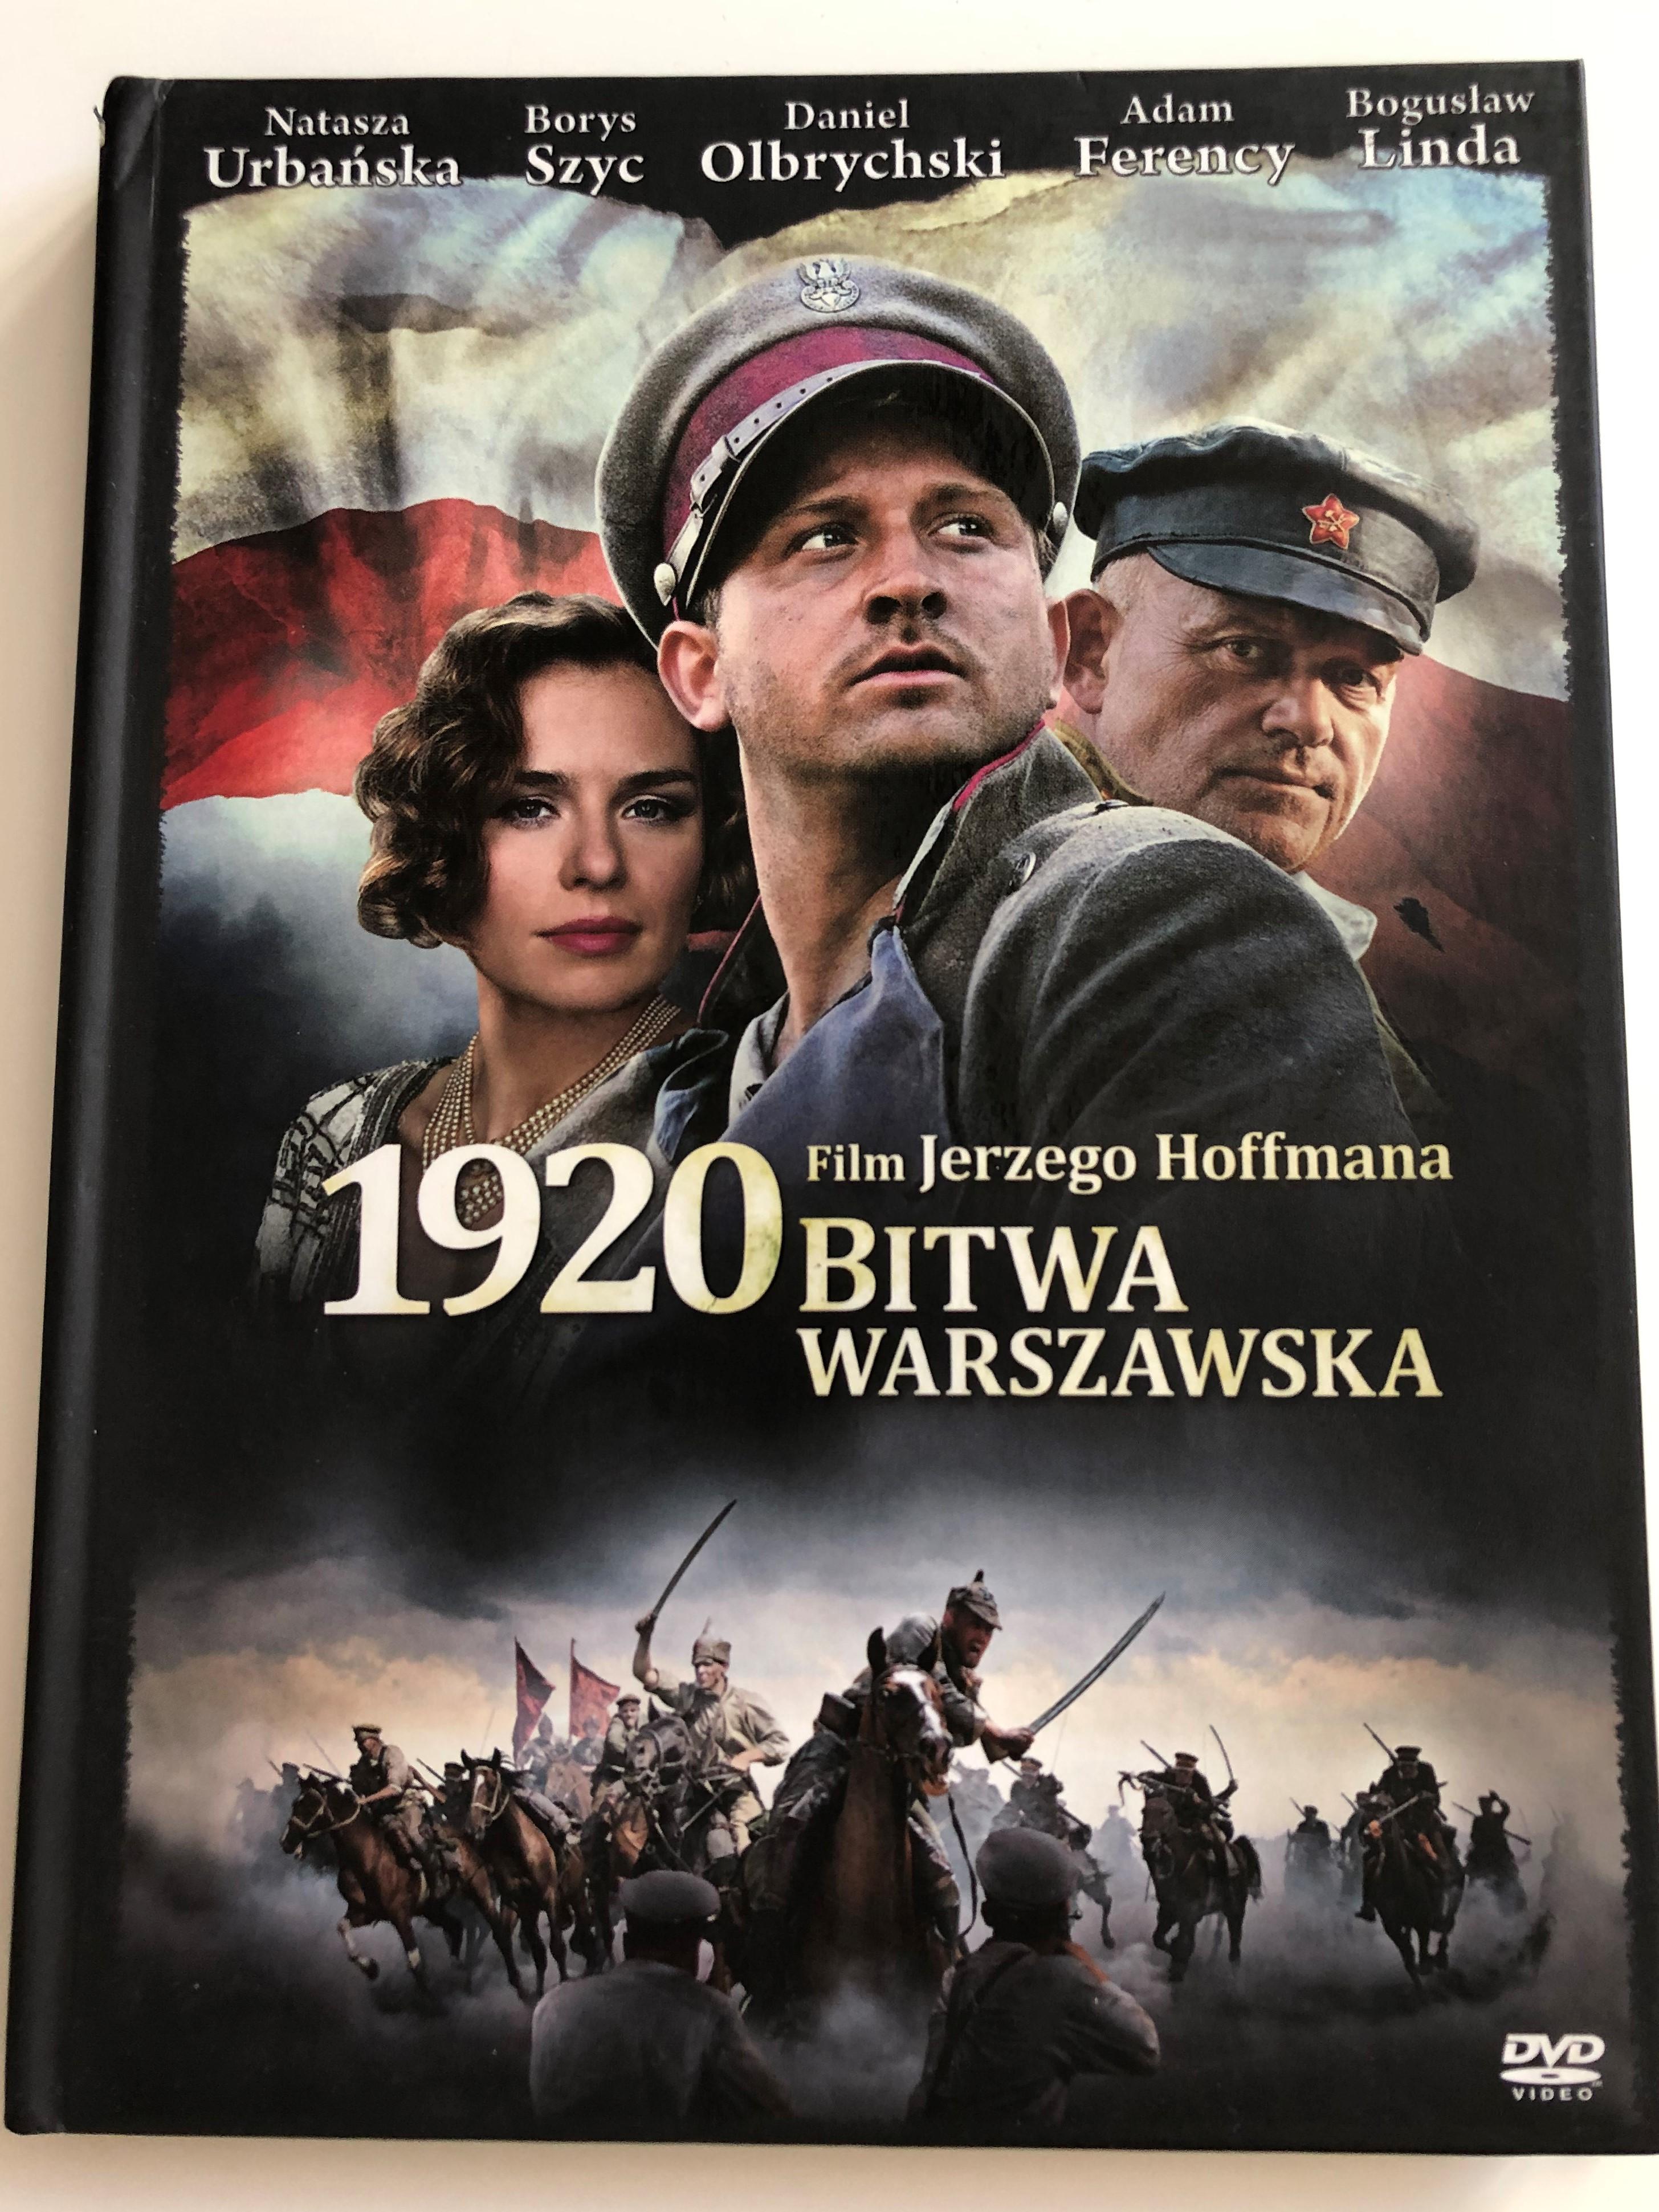 1920-bitwa-warszawska-dvd-2011-warsaw-battle-directed-by-jerzy-hoffman-1-.jpg